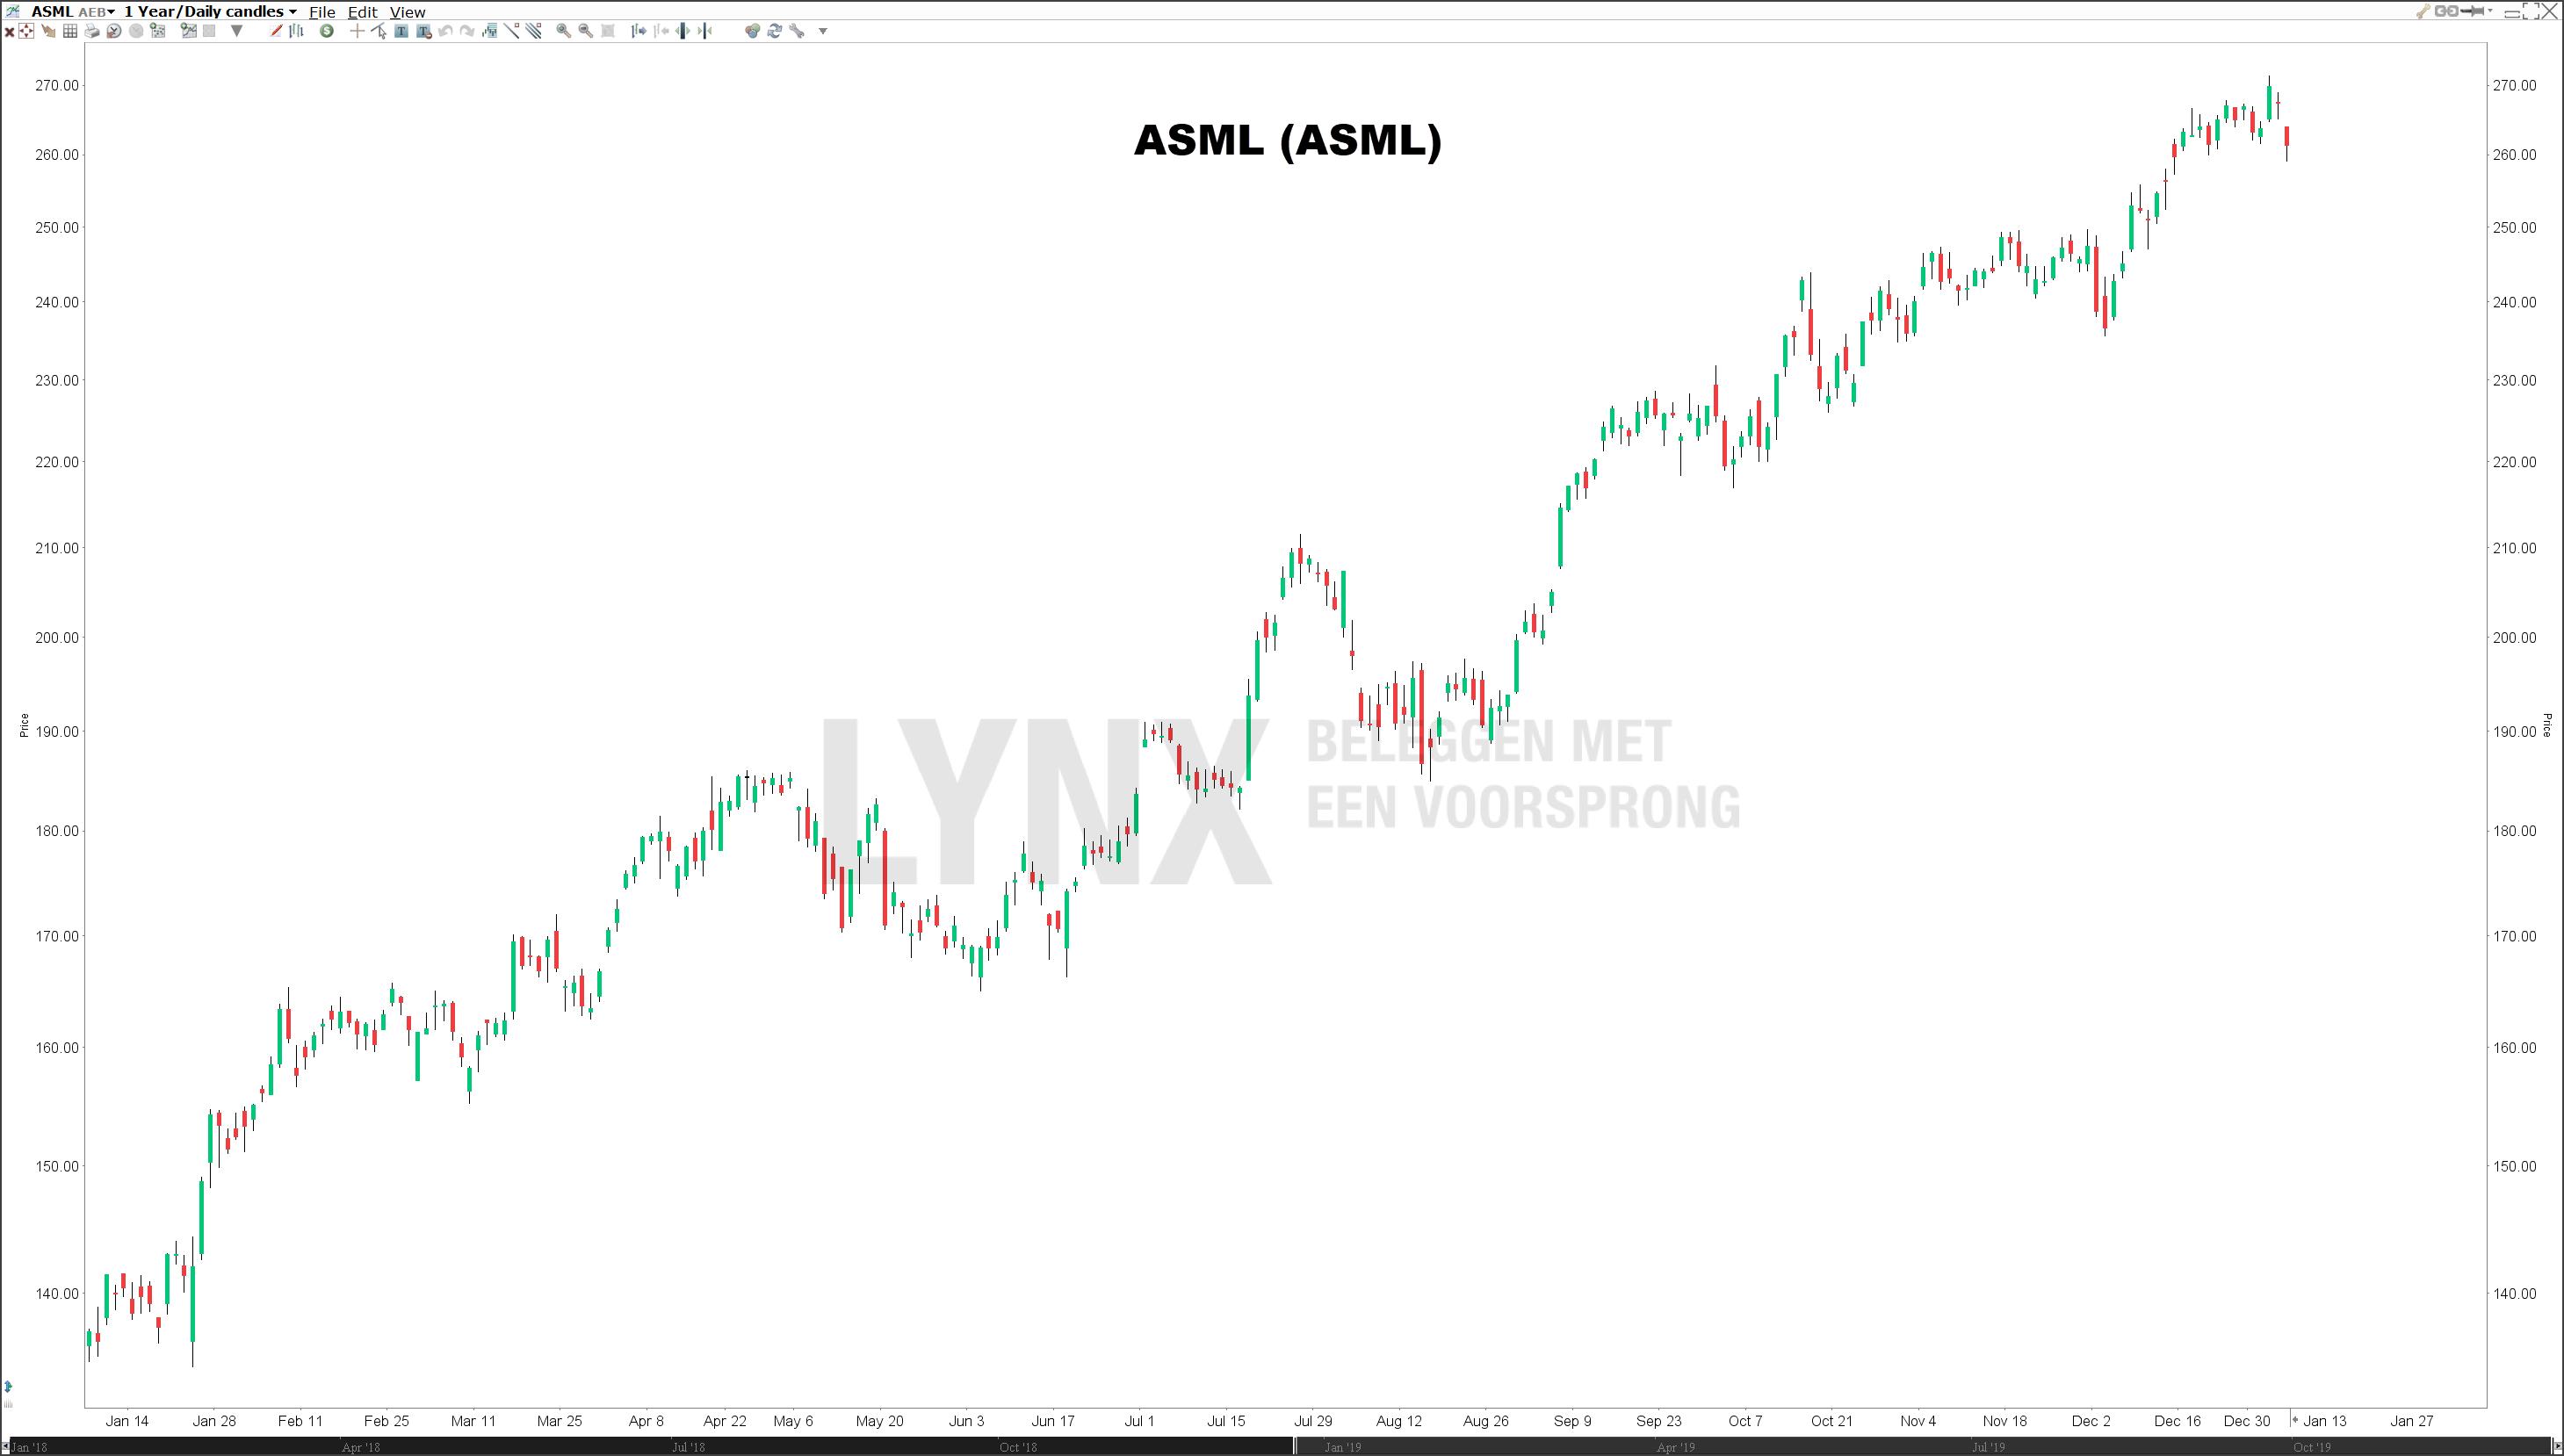 Koers ASML Nederlandse dividendaandelen